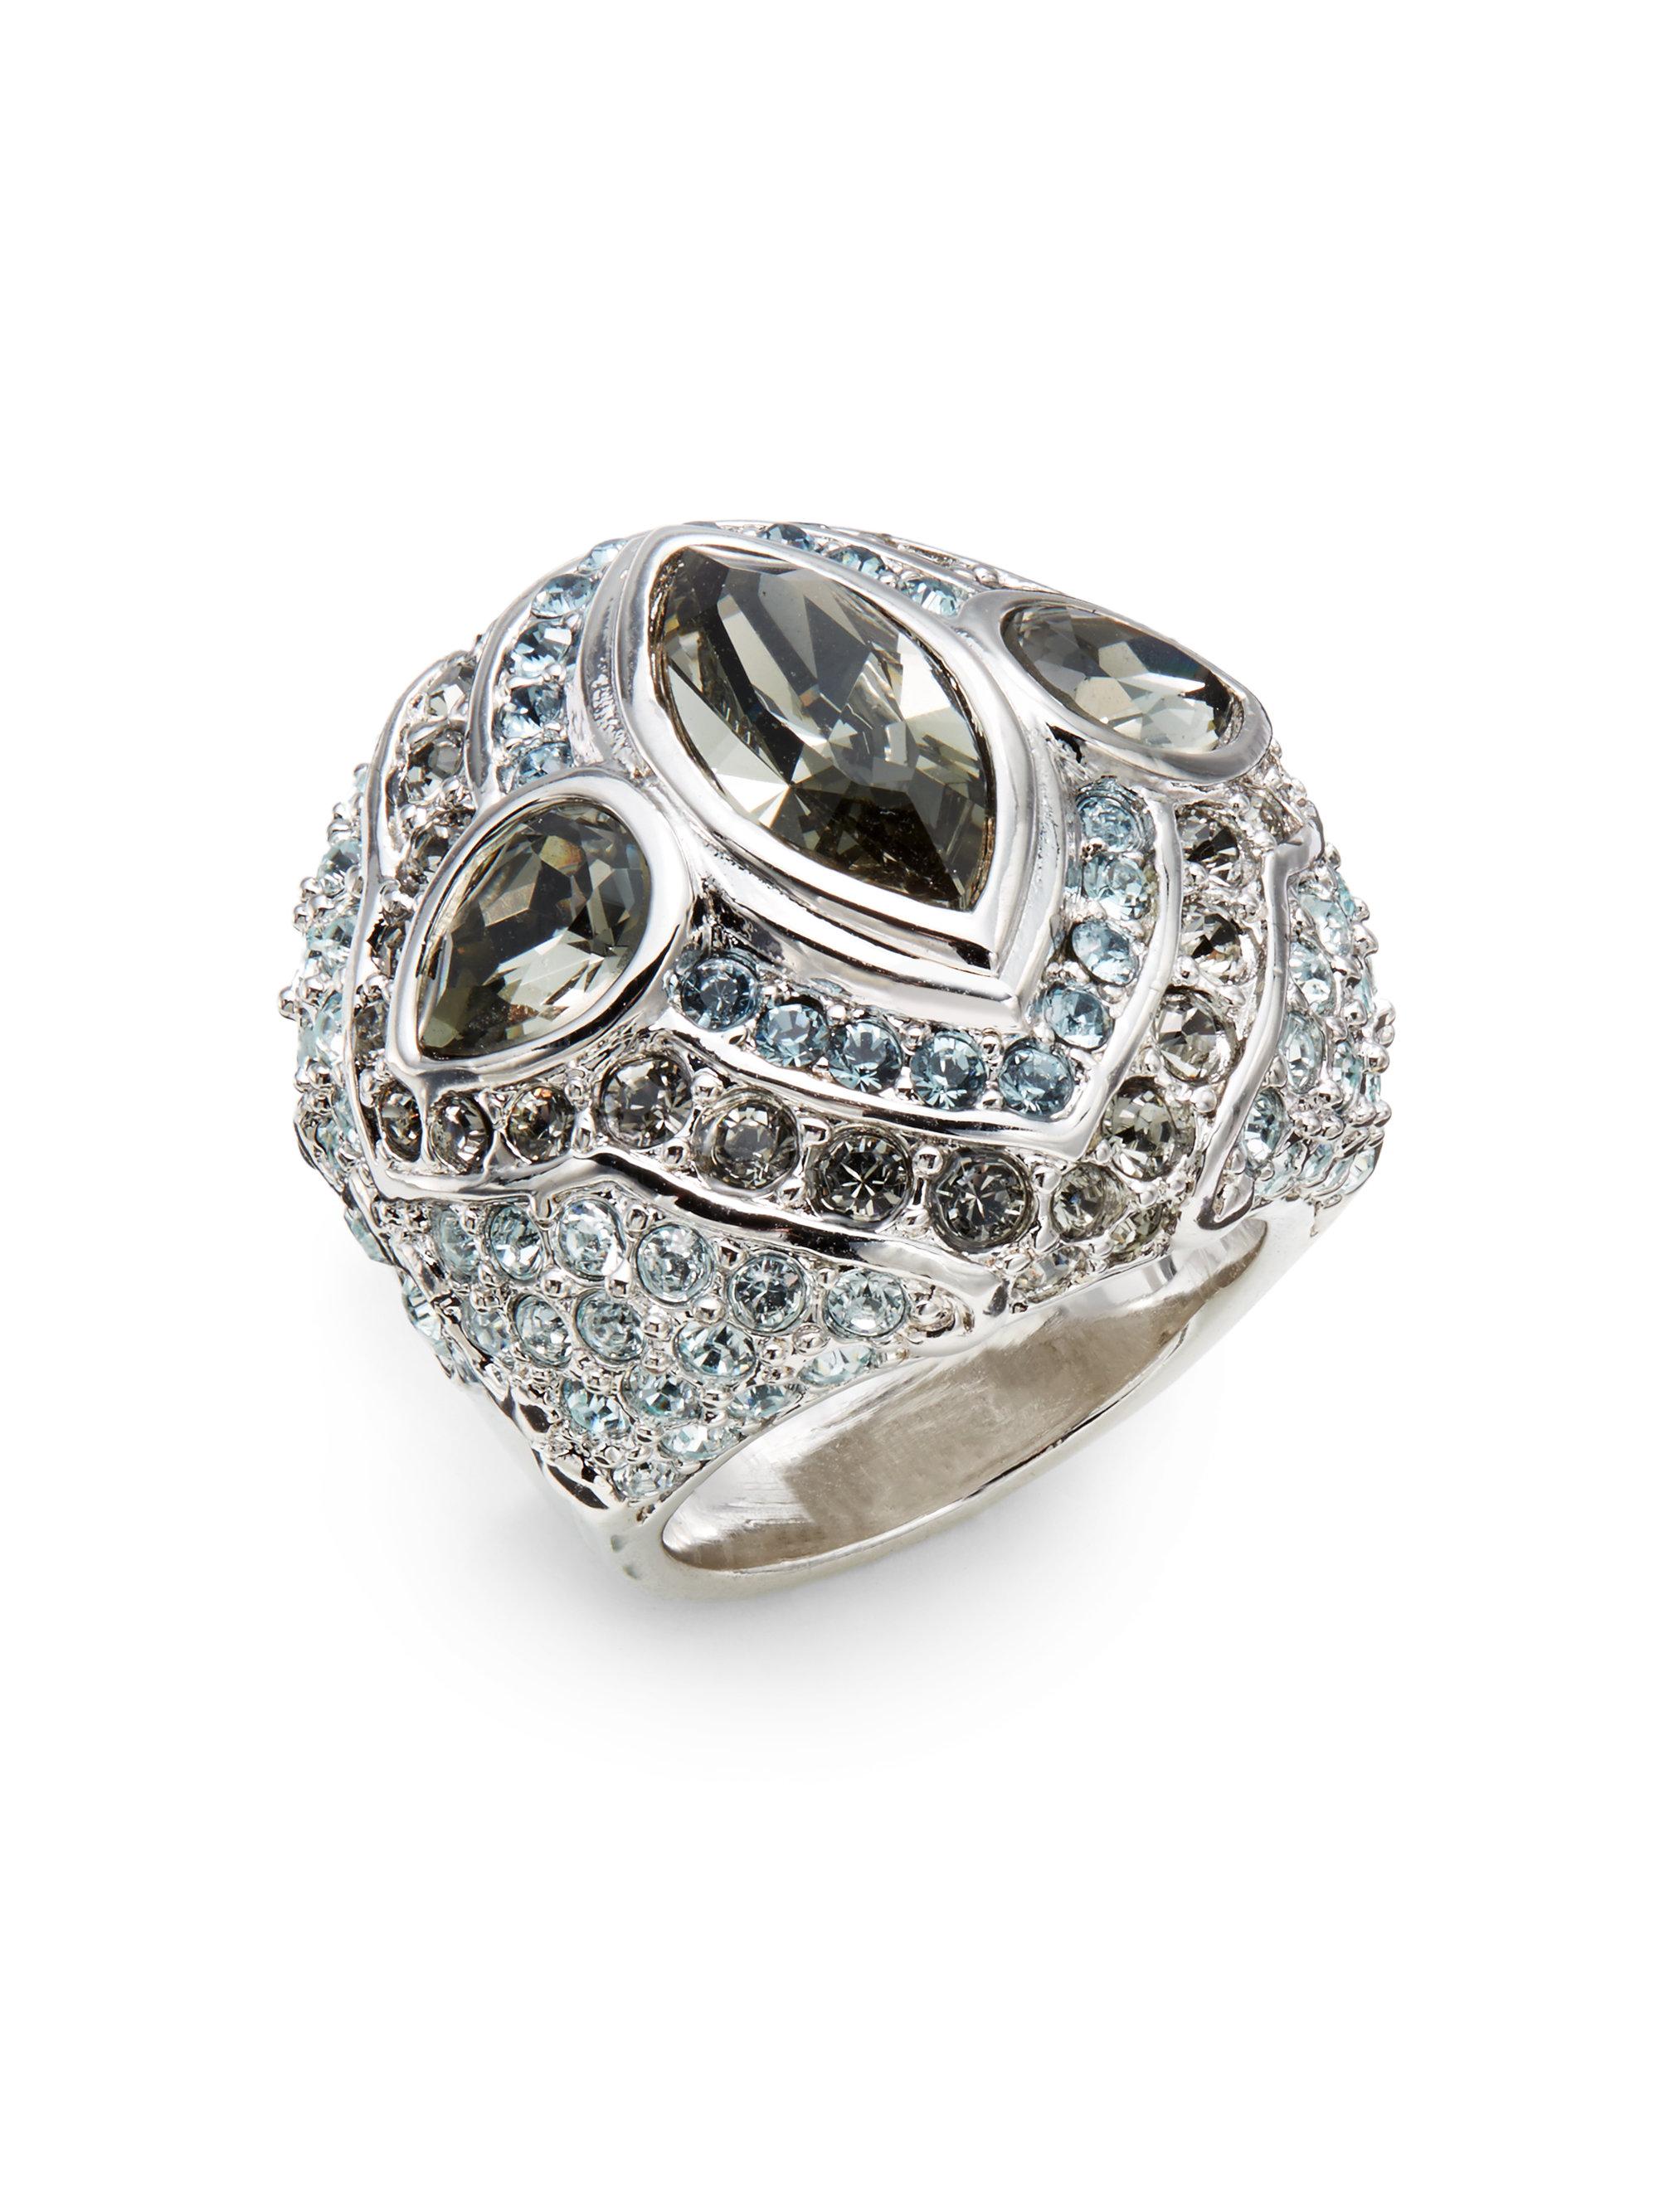 Judith Leiber Domed Pav 233 Crystal Cocktail Ring In Metallic